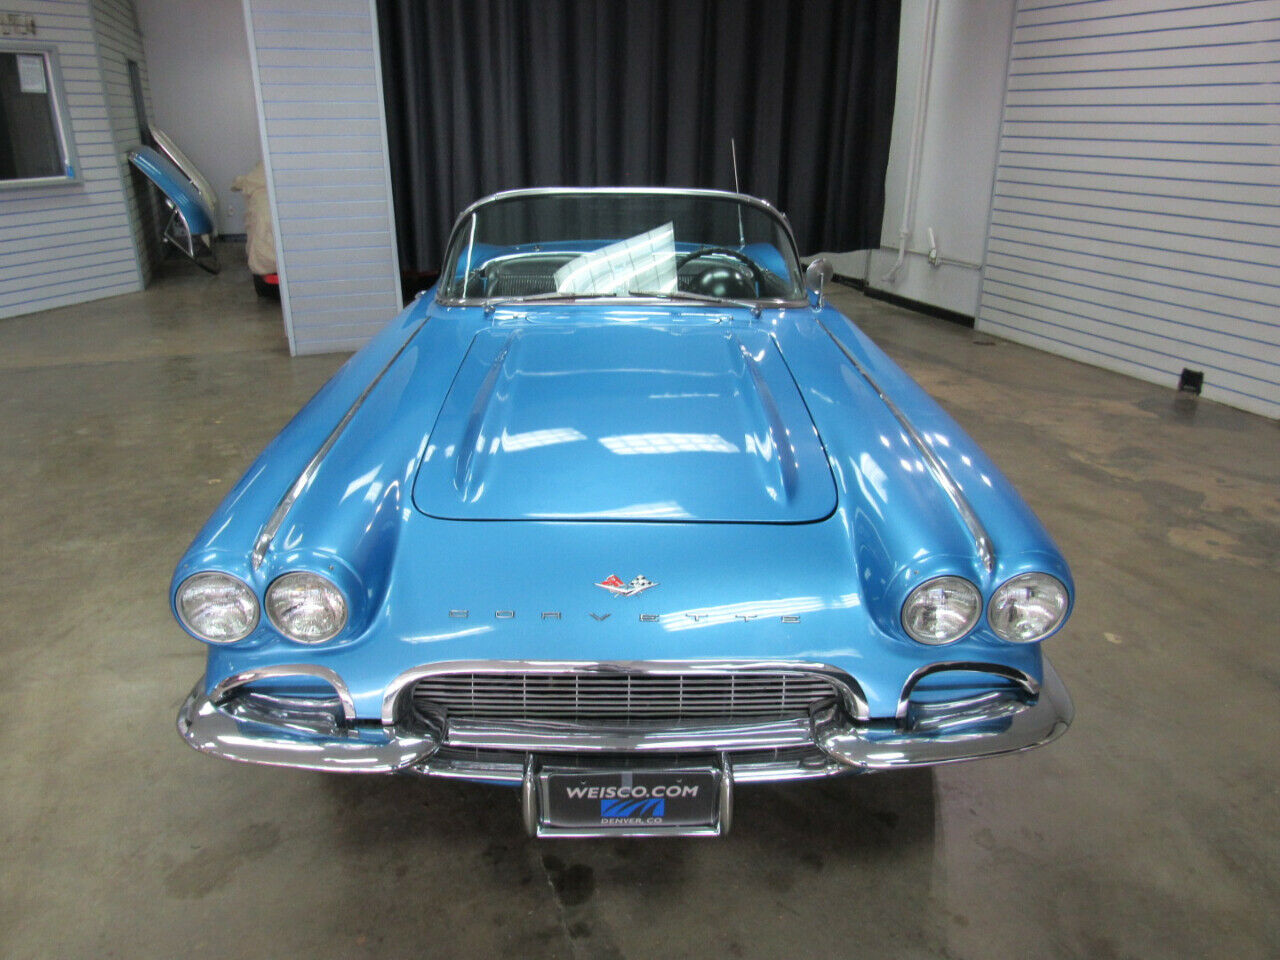 1961 Blue Chevrolet Corvette   | C1 Corvette Photo 7